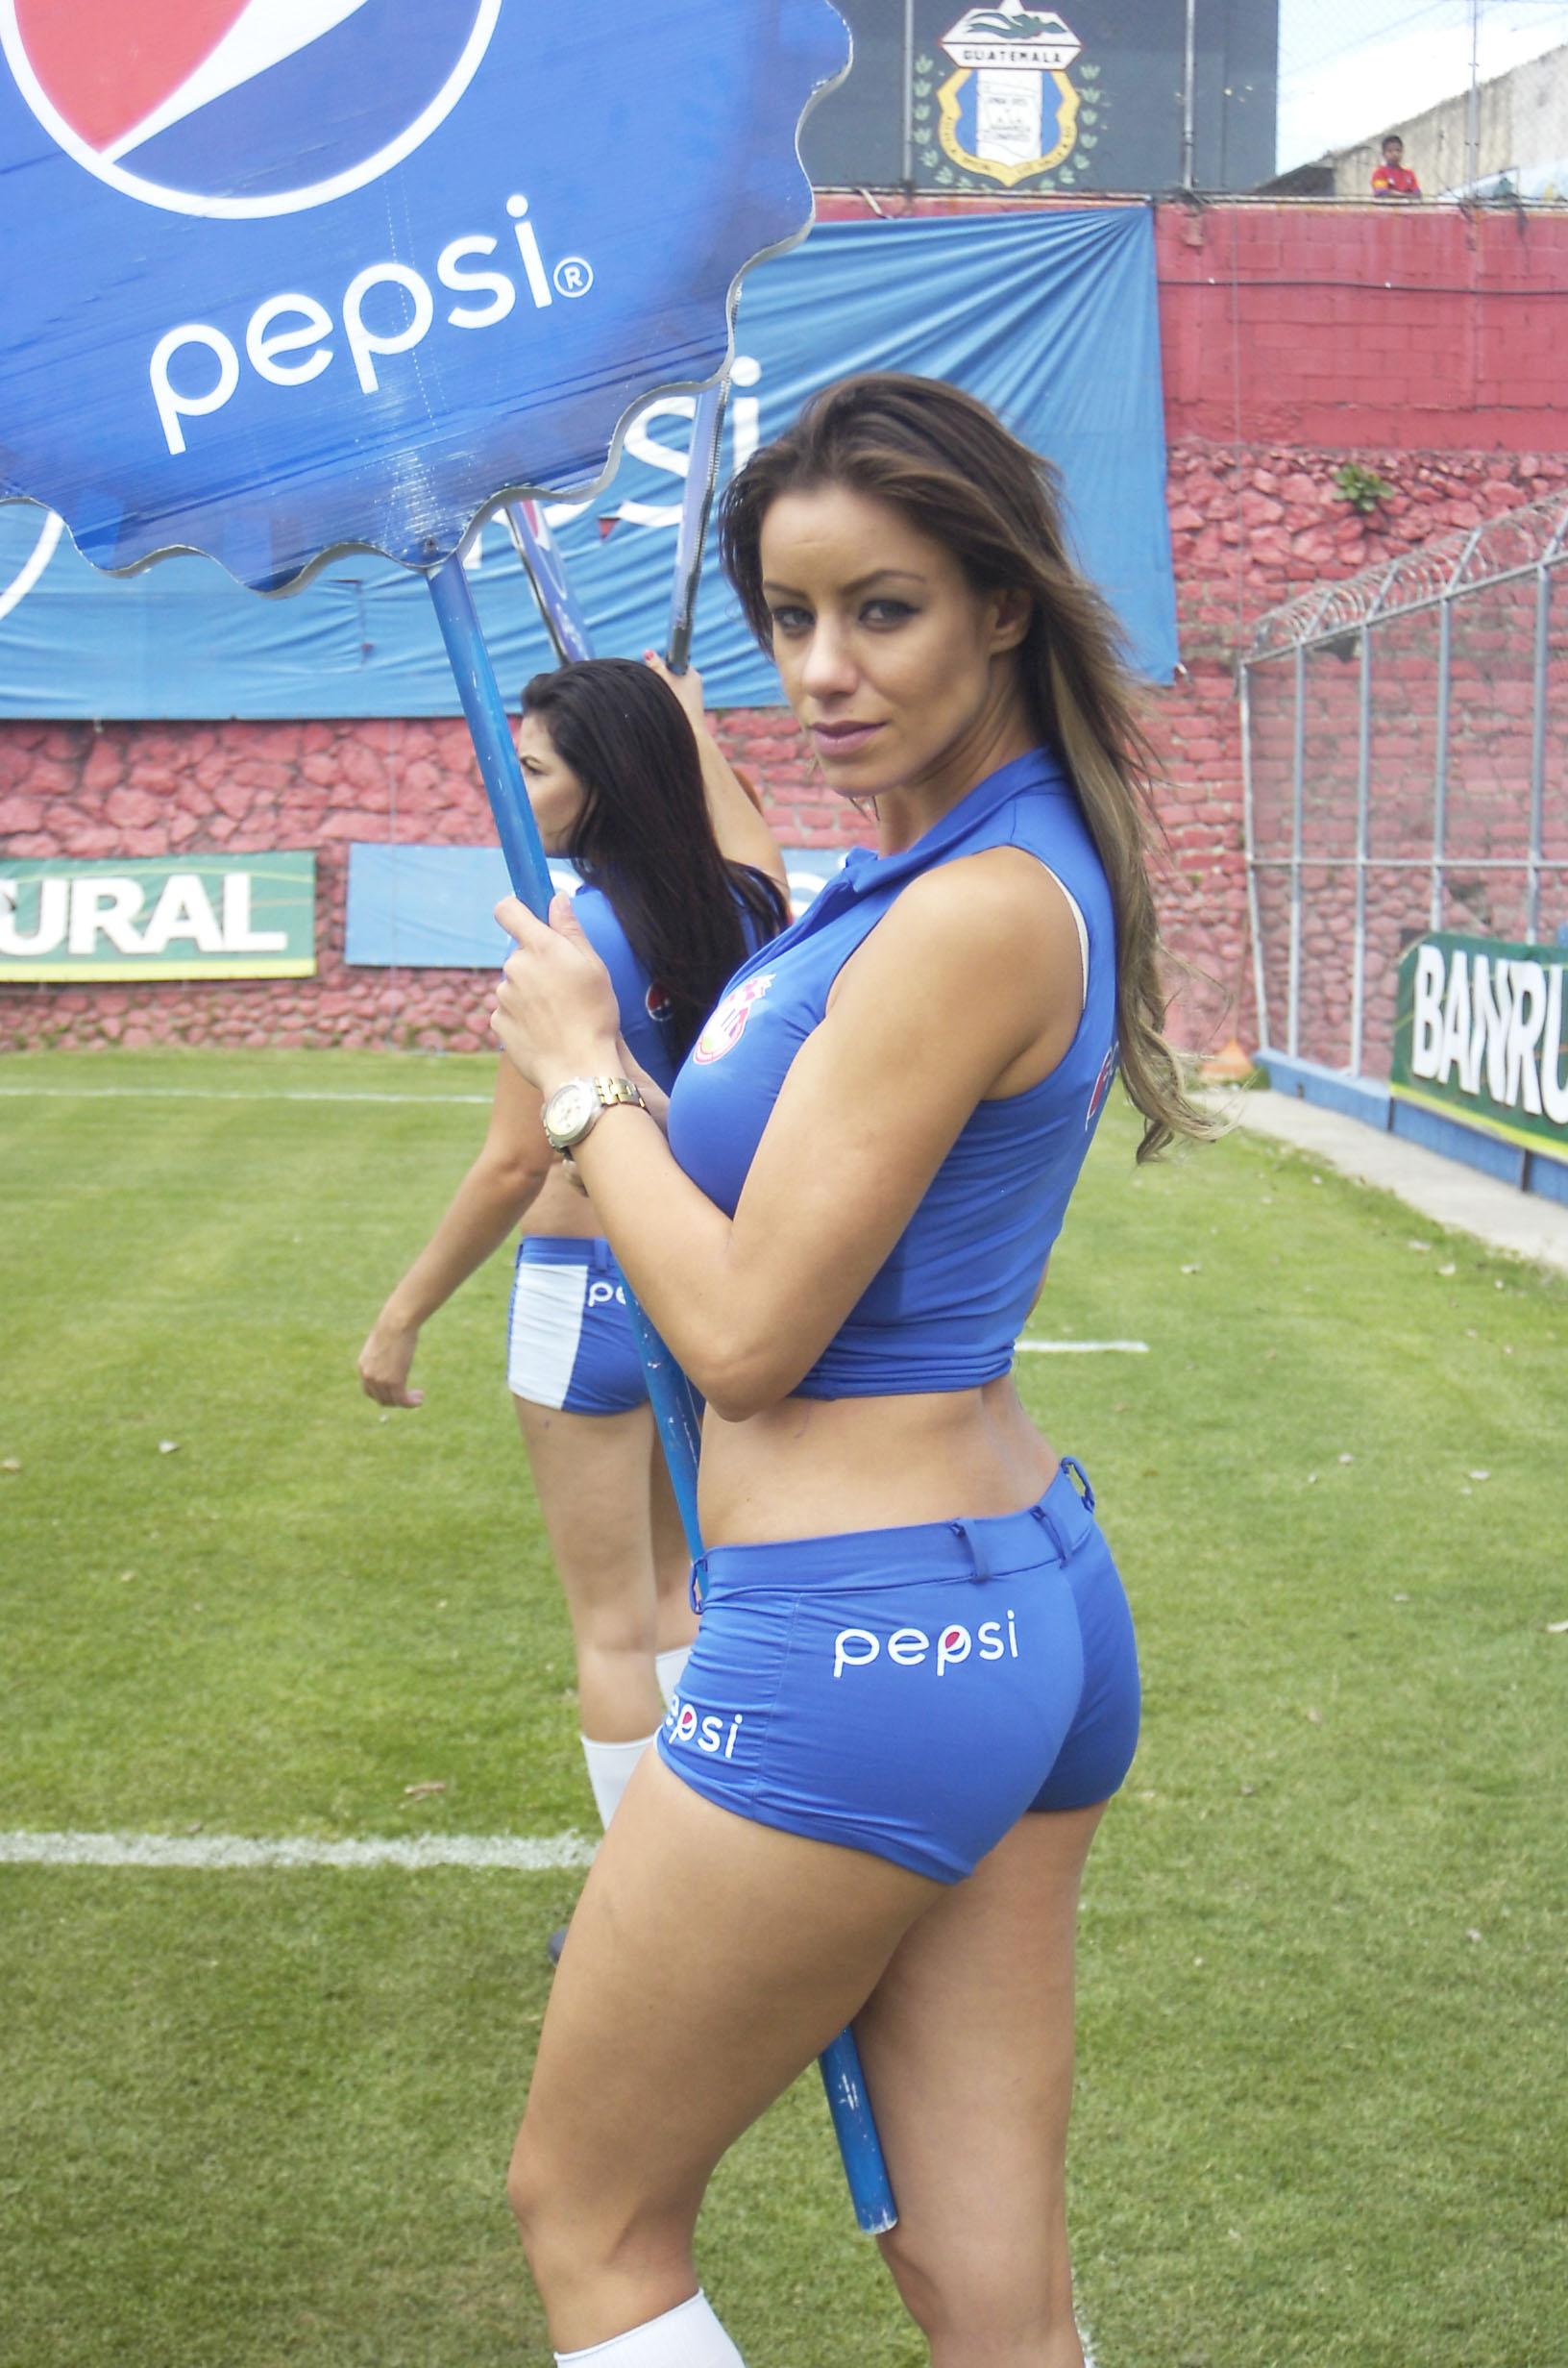 Amanda B. de Brasil 2139